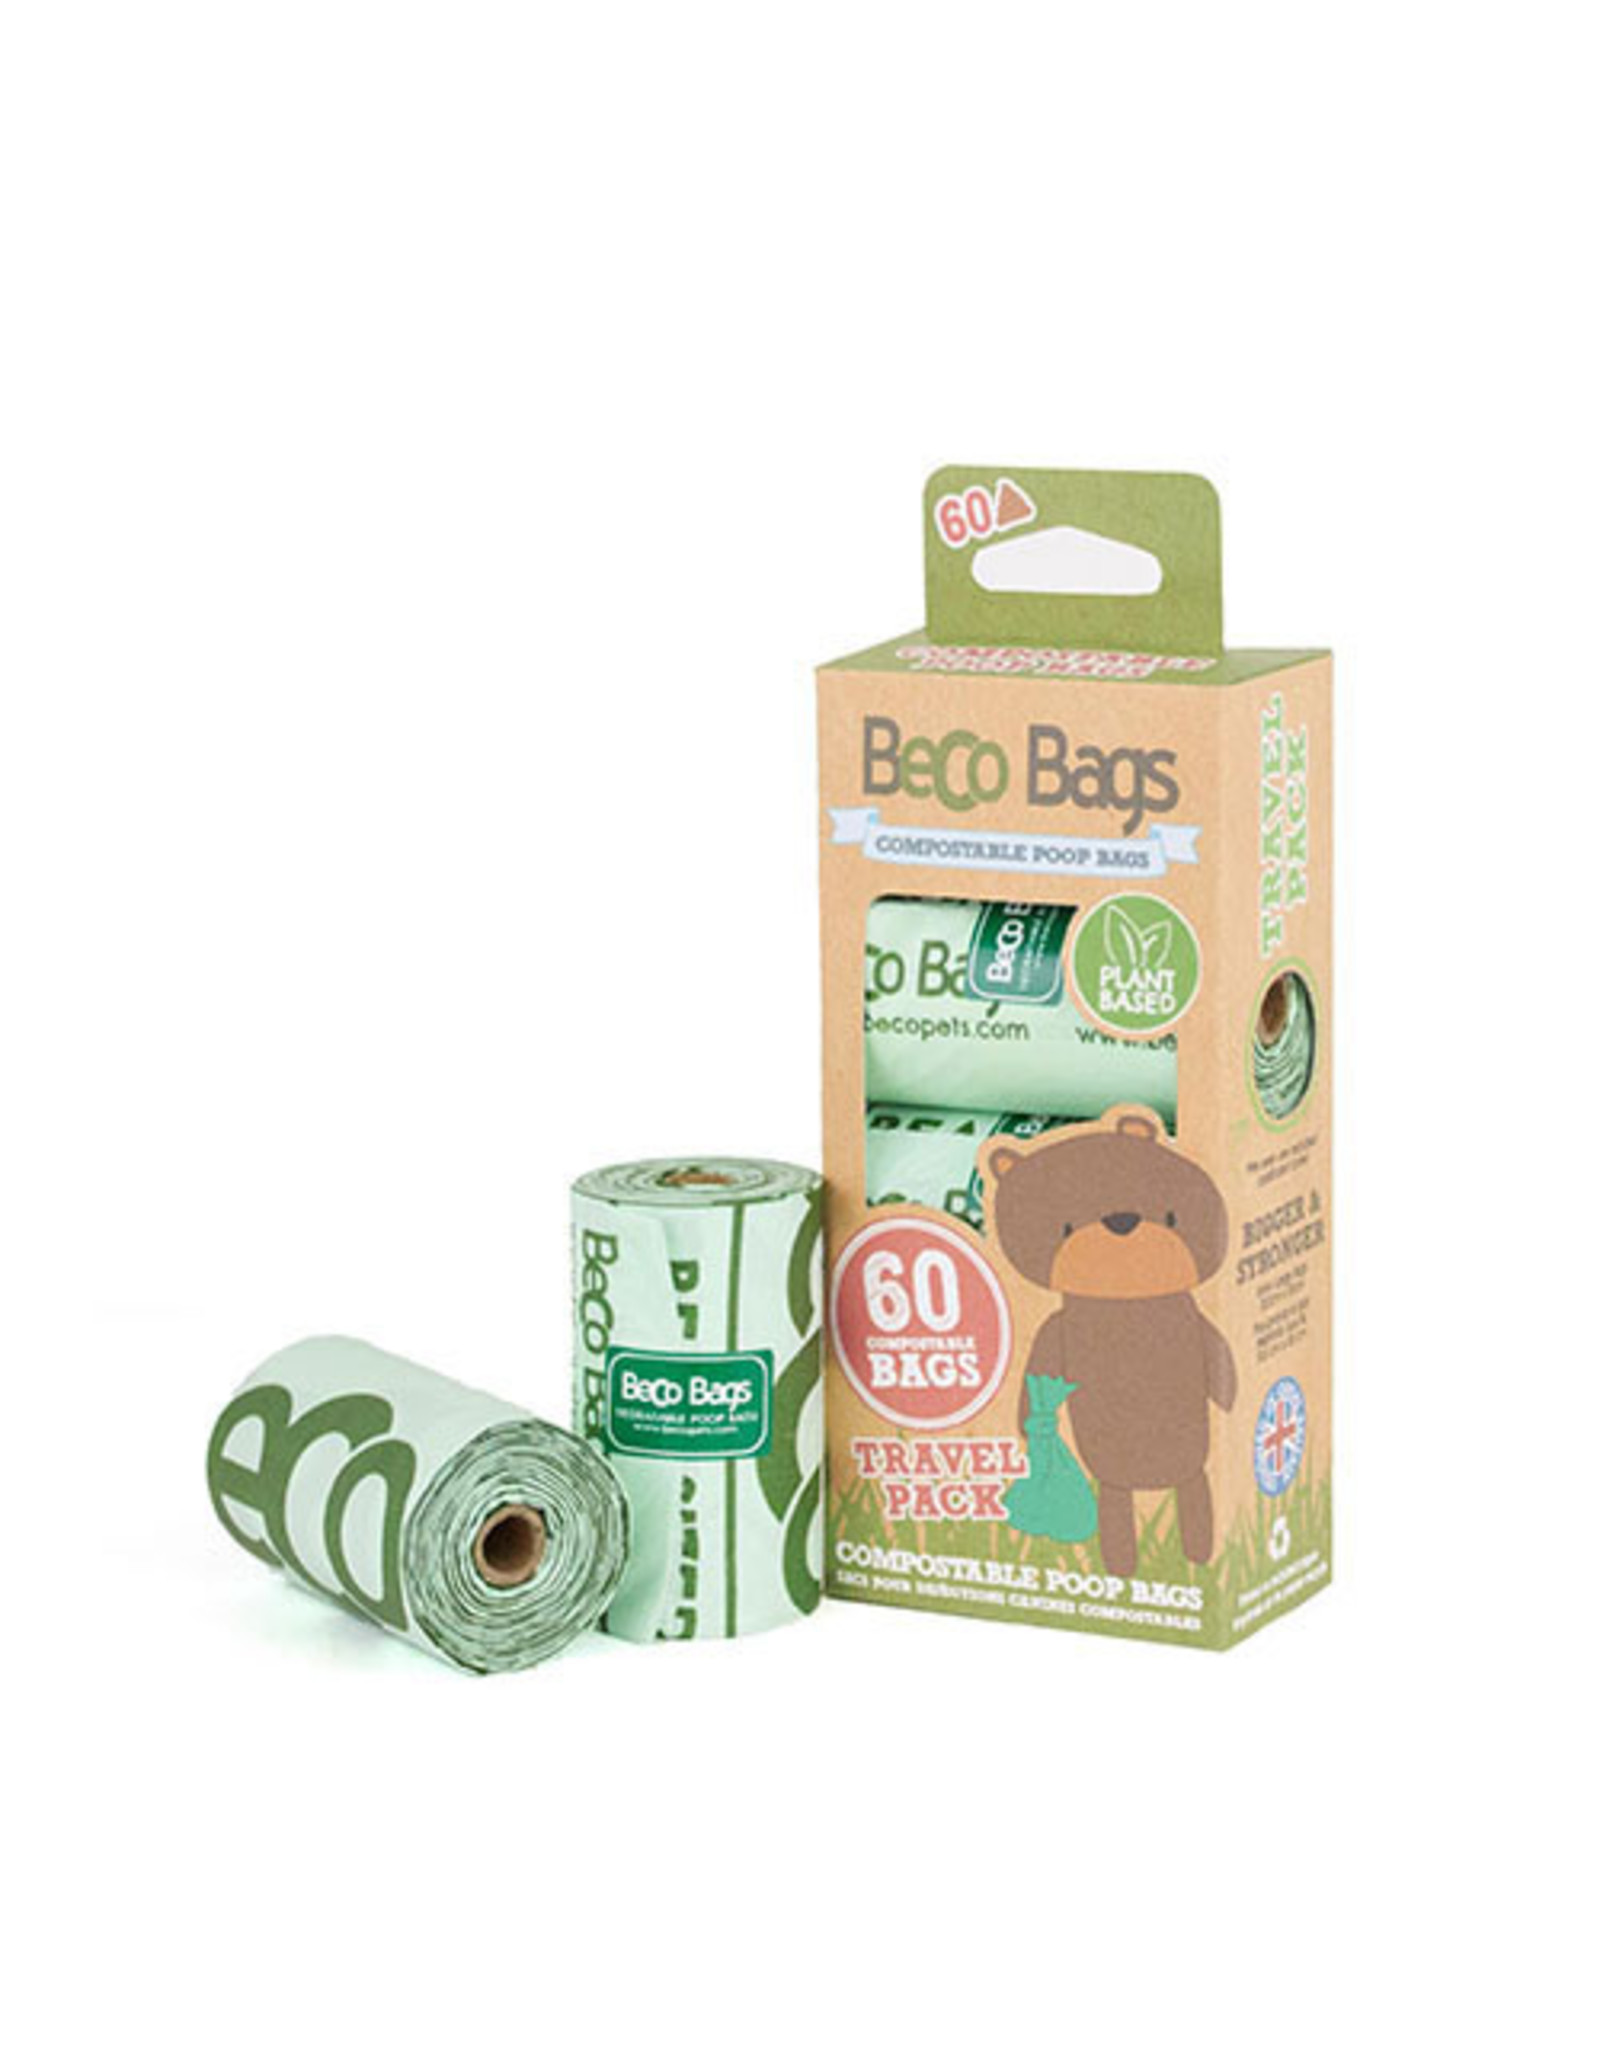 Beco Pets Beco Bags - Compostable 4pk - 60 bags